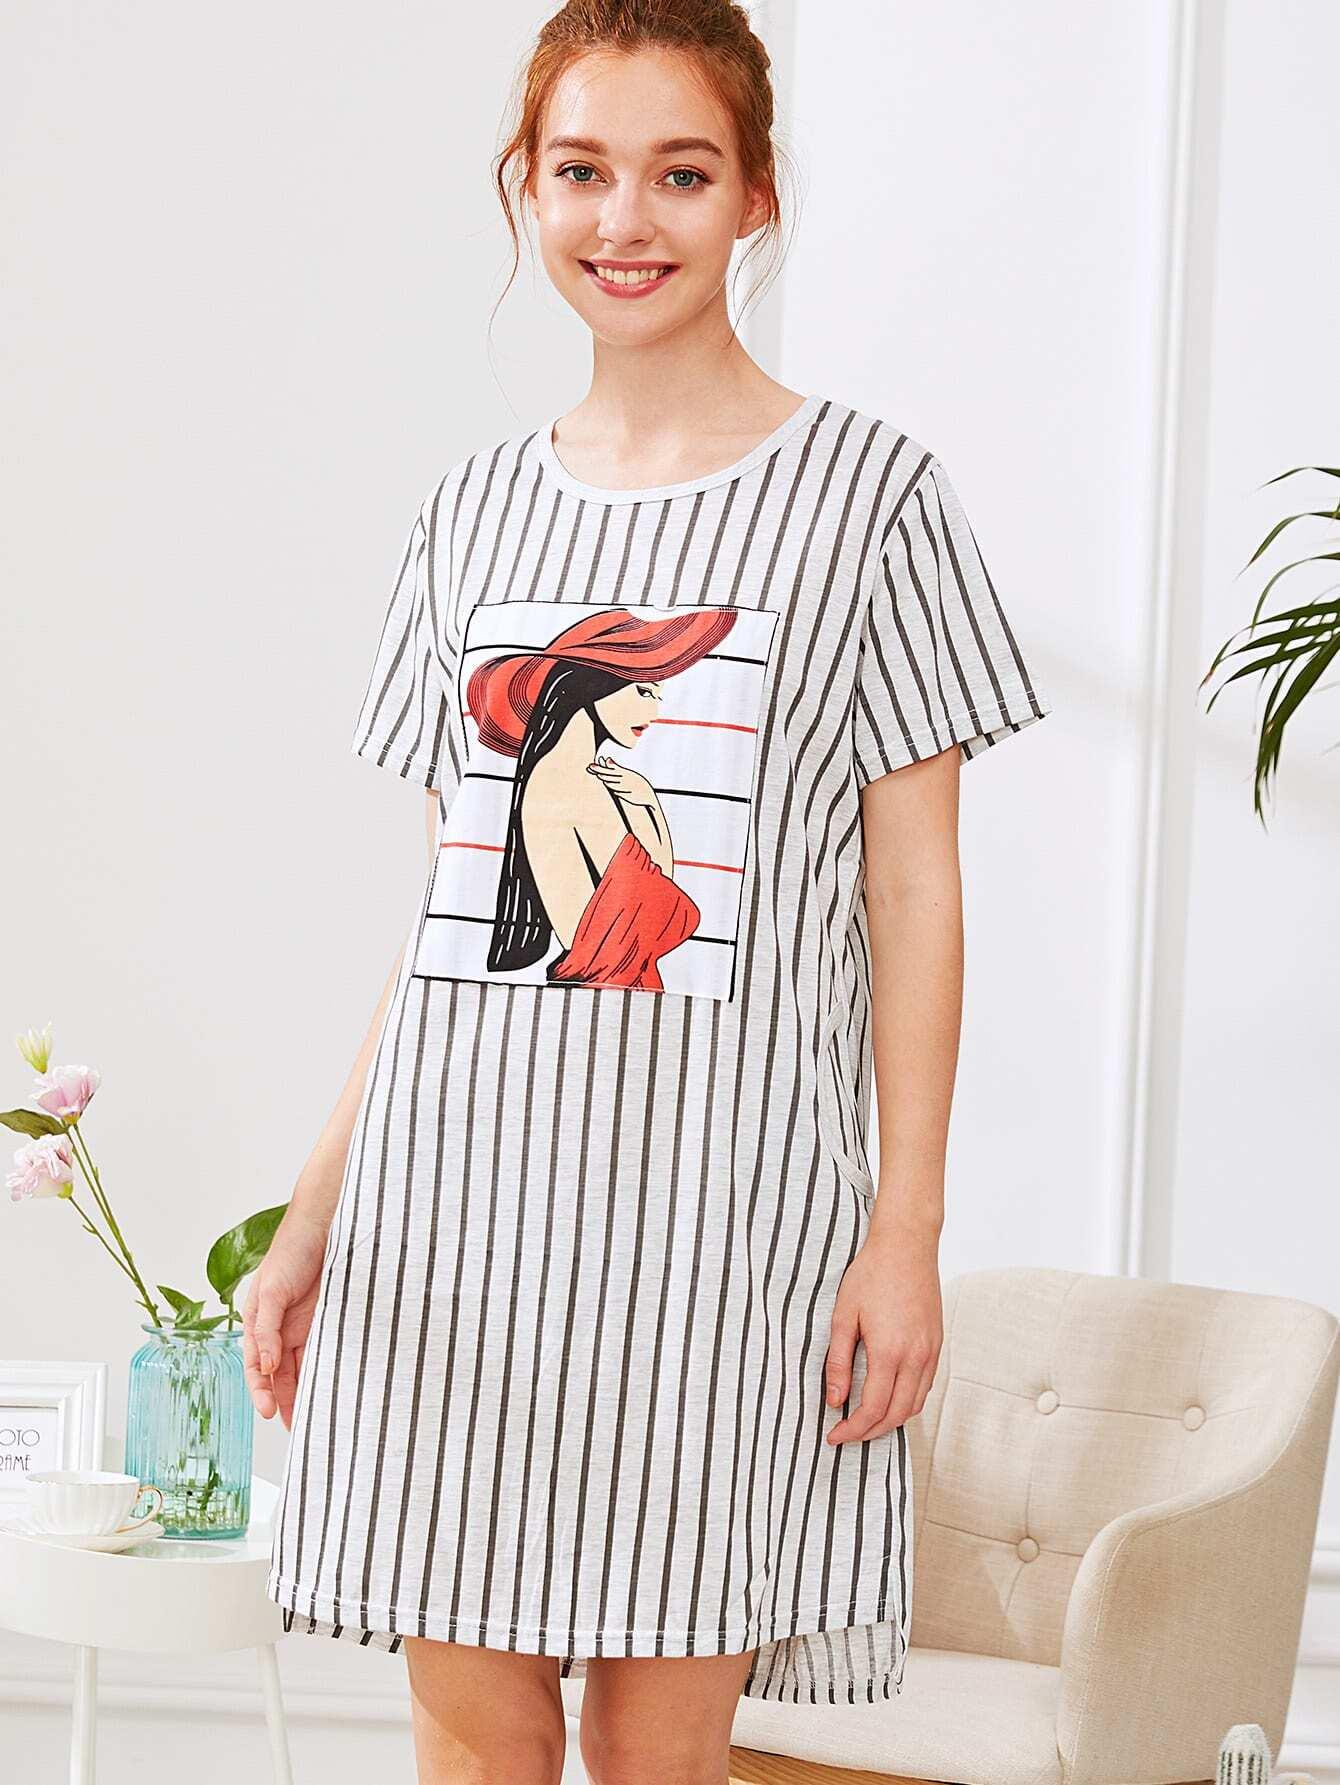 Girl Print Striped Dress exmork 100 вт 12 в poly si